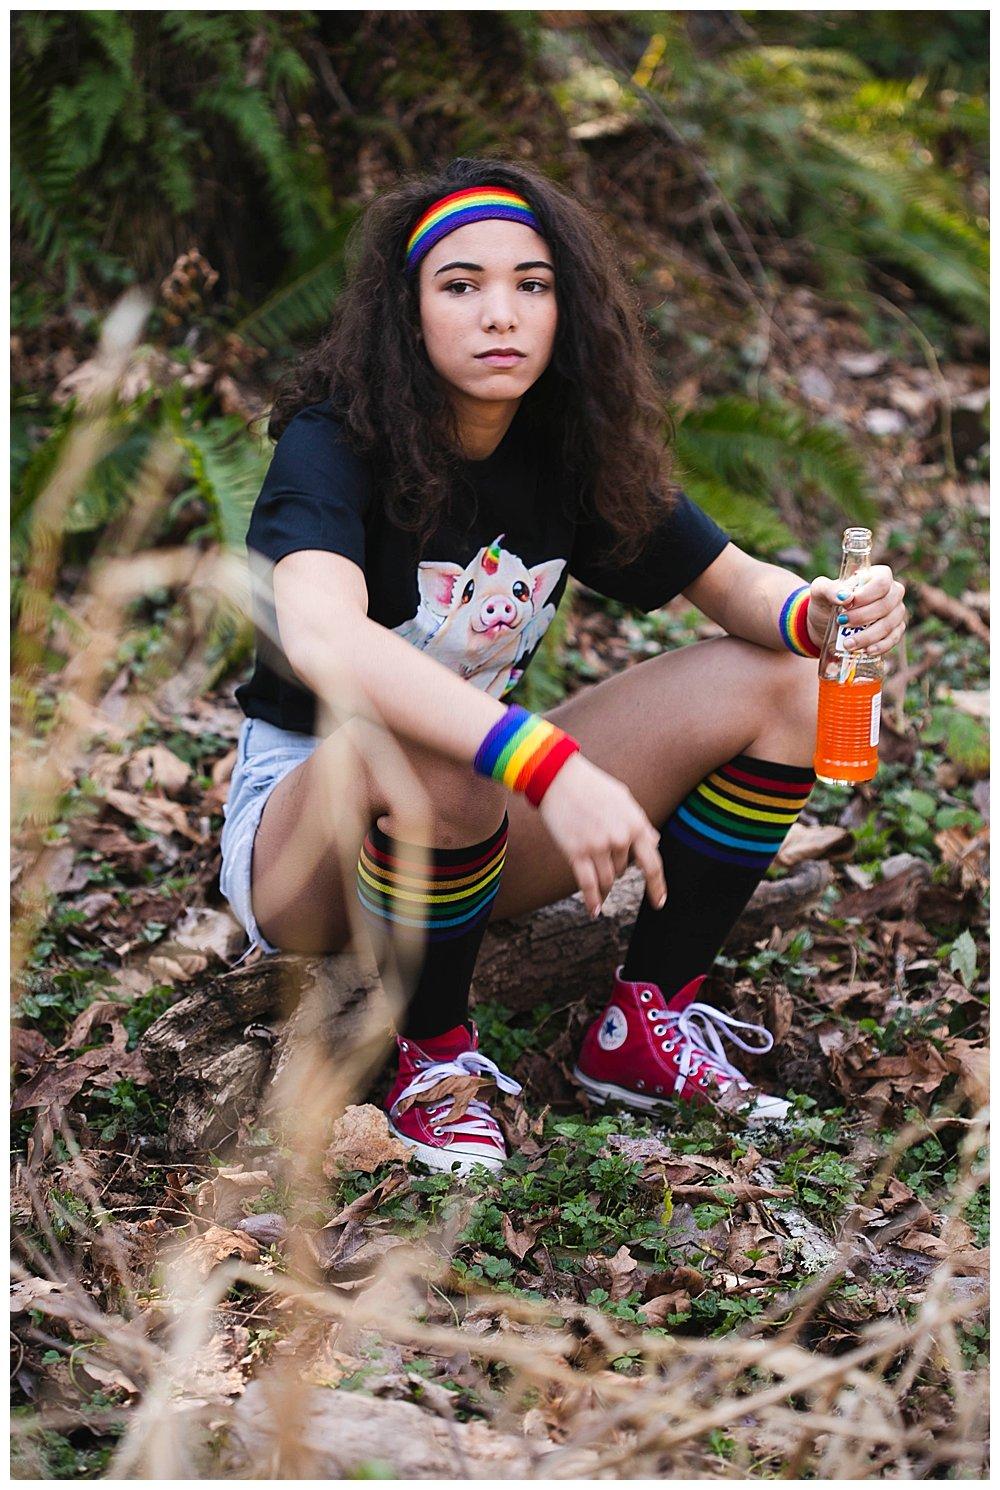 Sassy Avi in the woods.